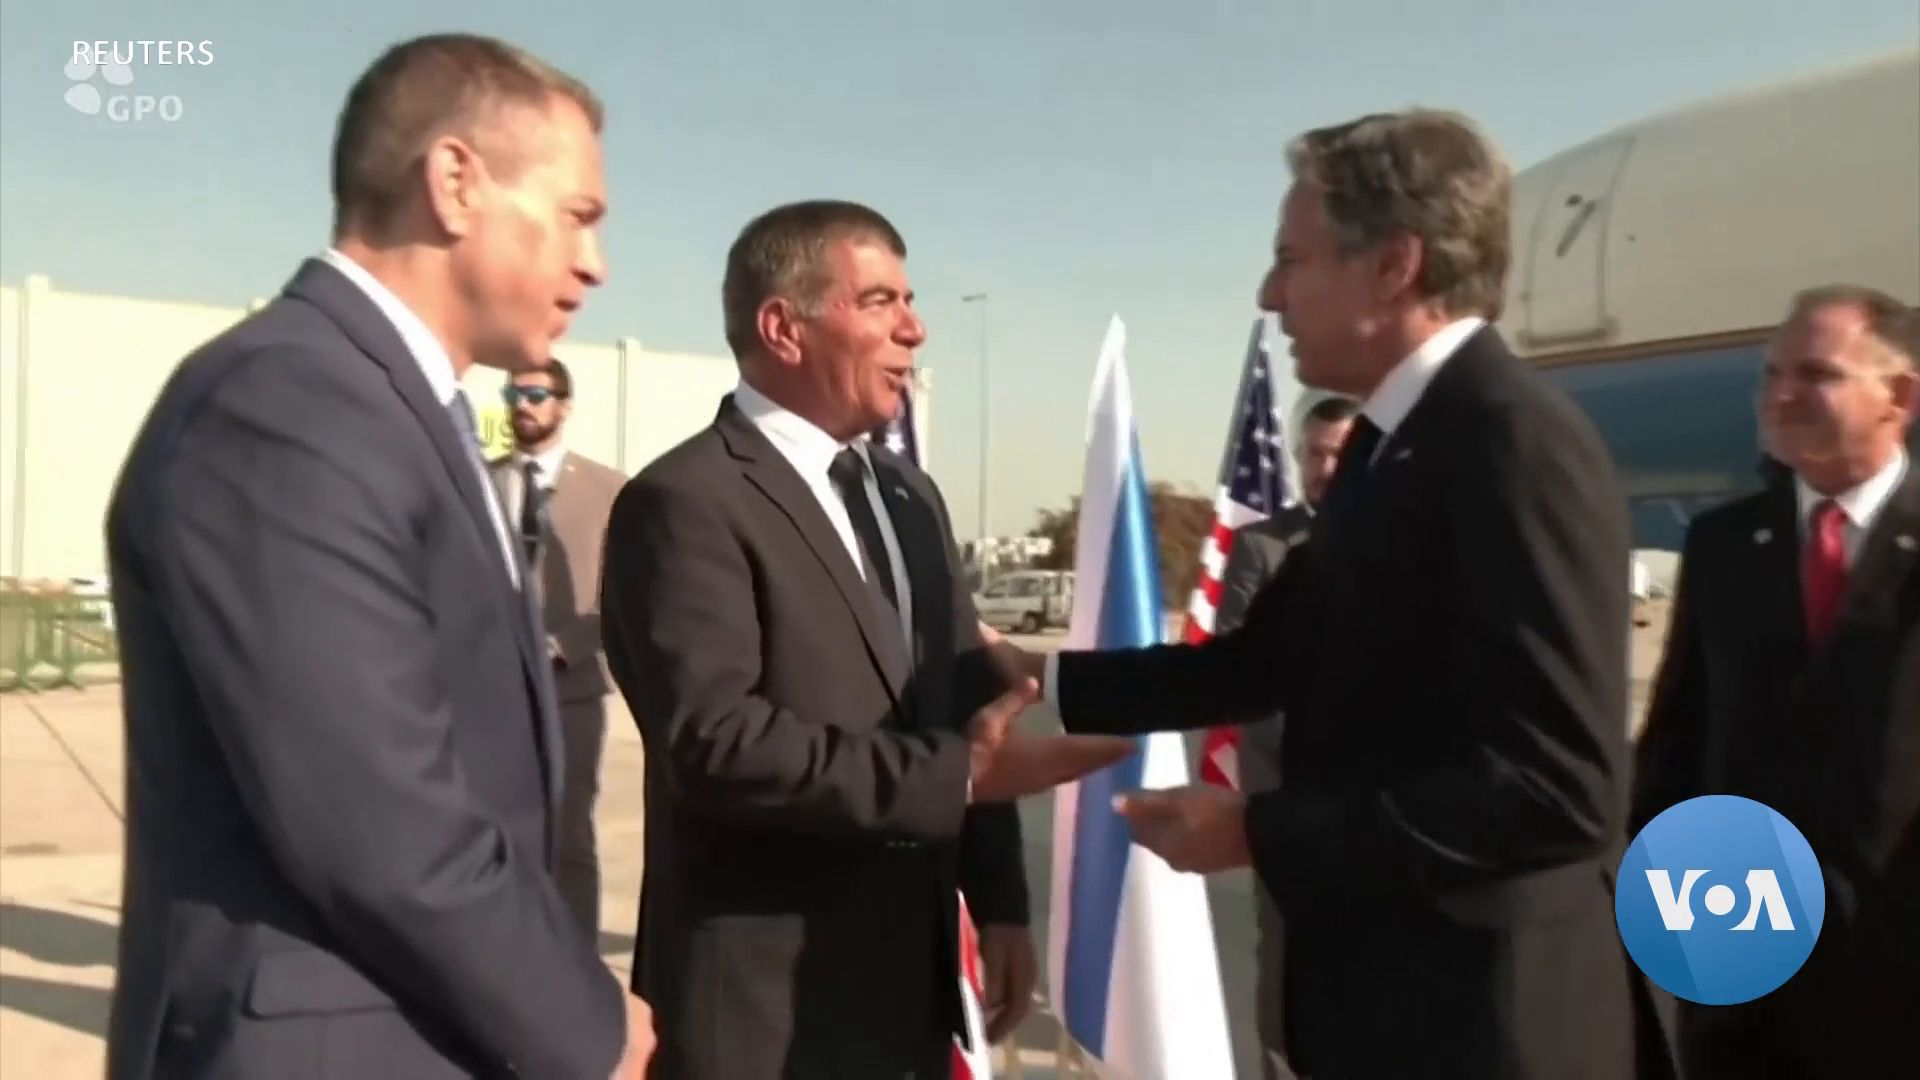 Blinken Works to Build More Lasting Bridges as Israeli Palestinian Cease-fire Takes Hold